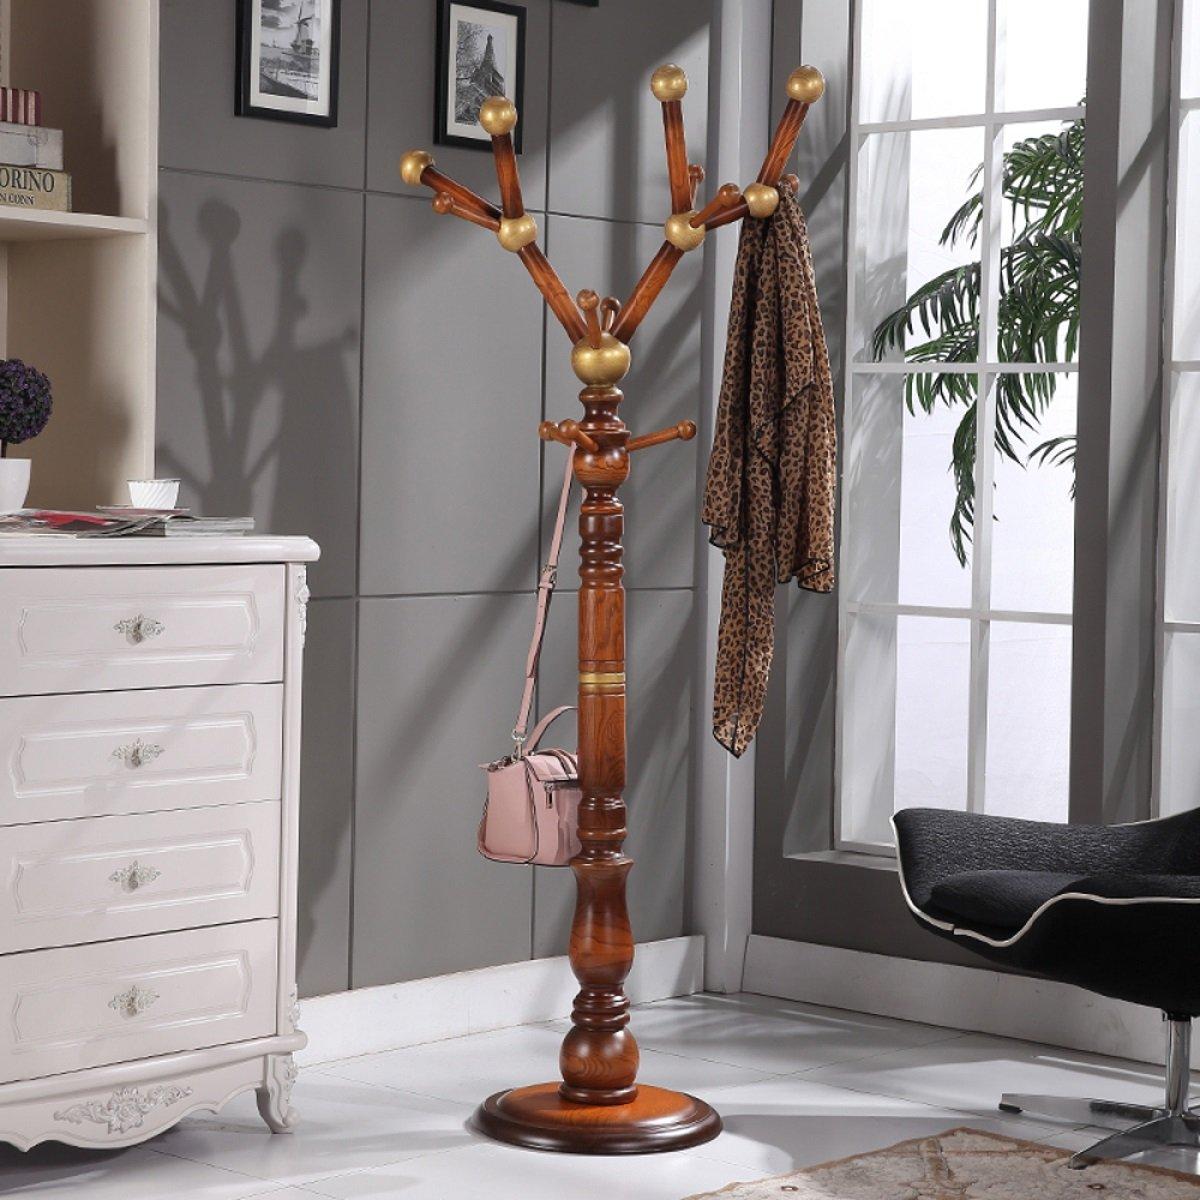 LF Coat rack Perchero de Madera Maciza Home FloorType Extraíble Ensamble Economy Tree Branch Hanger (180 * 40cm) (Color : Oro)